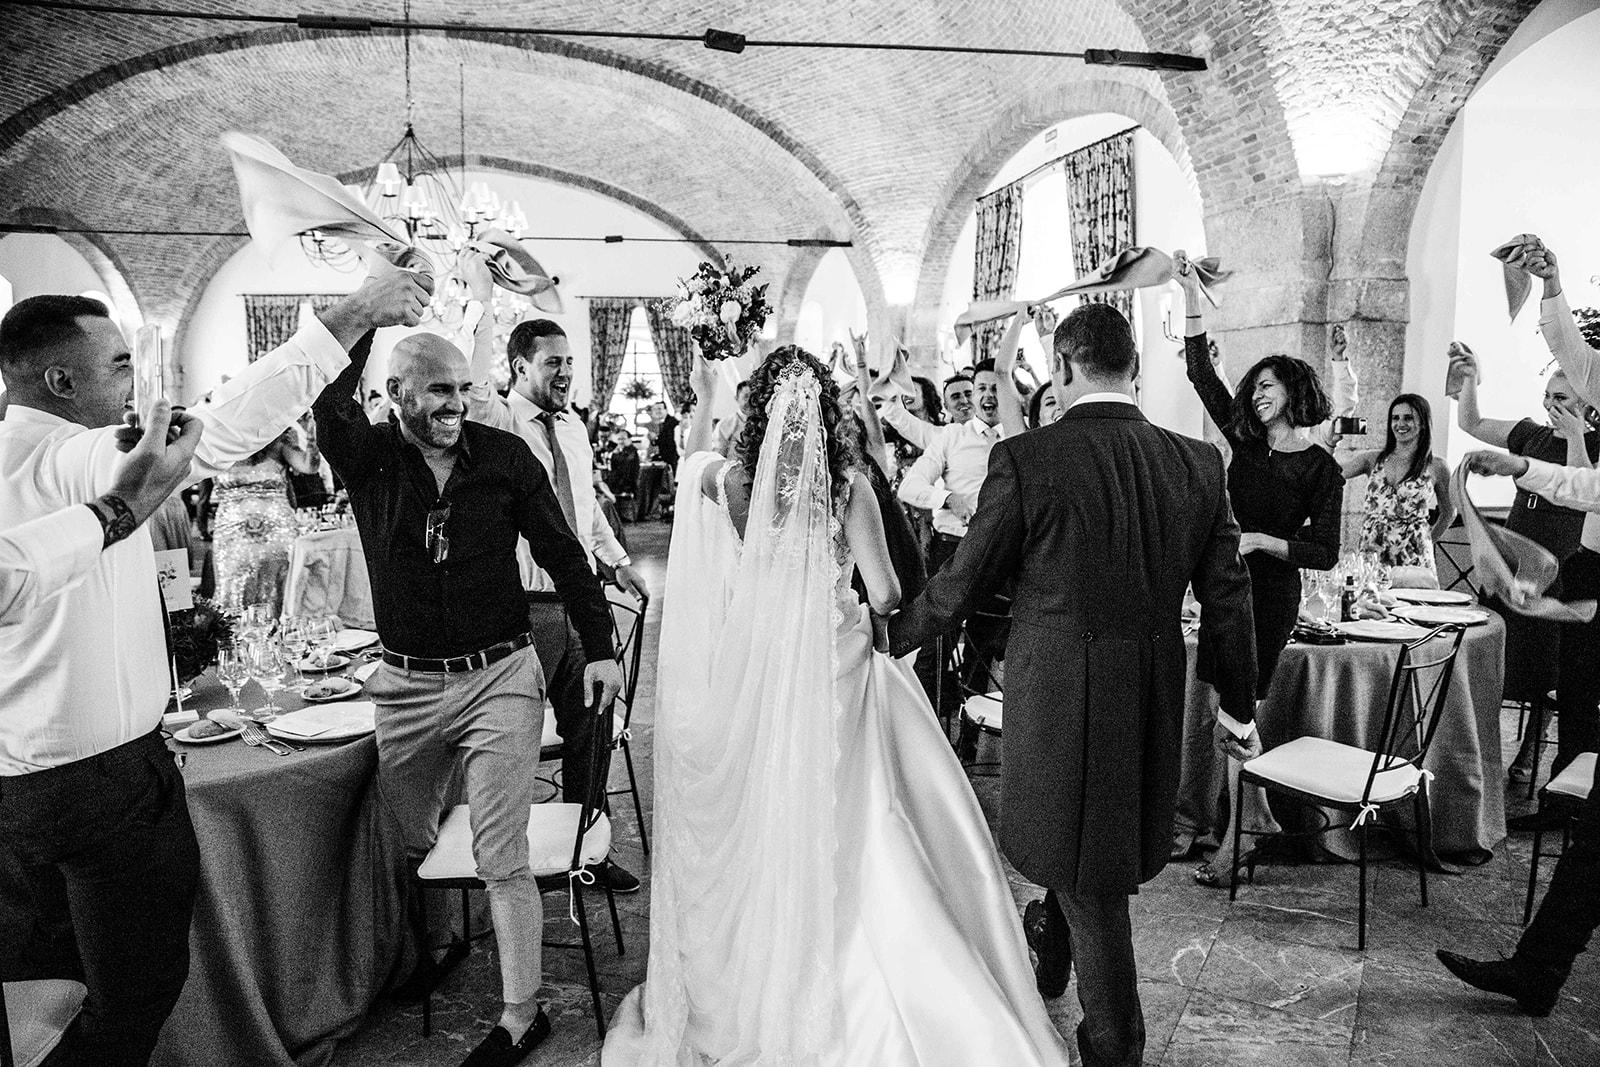 entrada pareja en Boda en Pabellon de Caza Castillo de Viñuelas Madrid